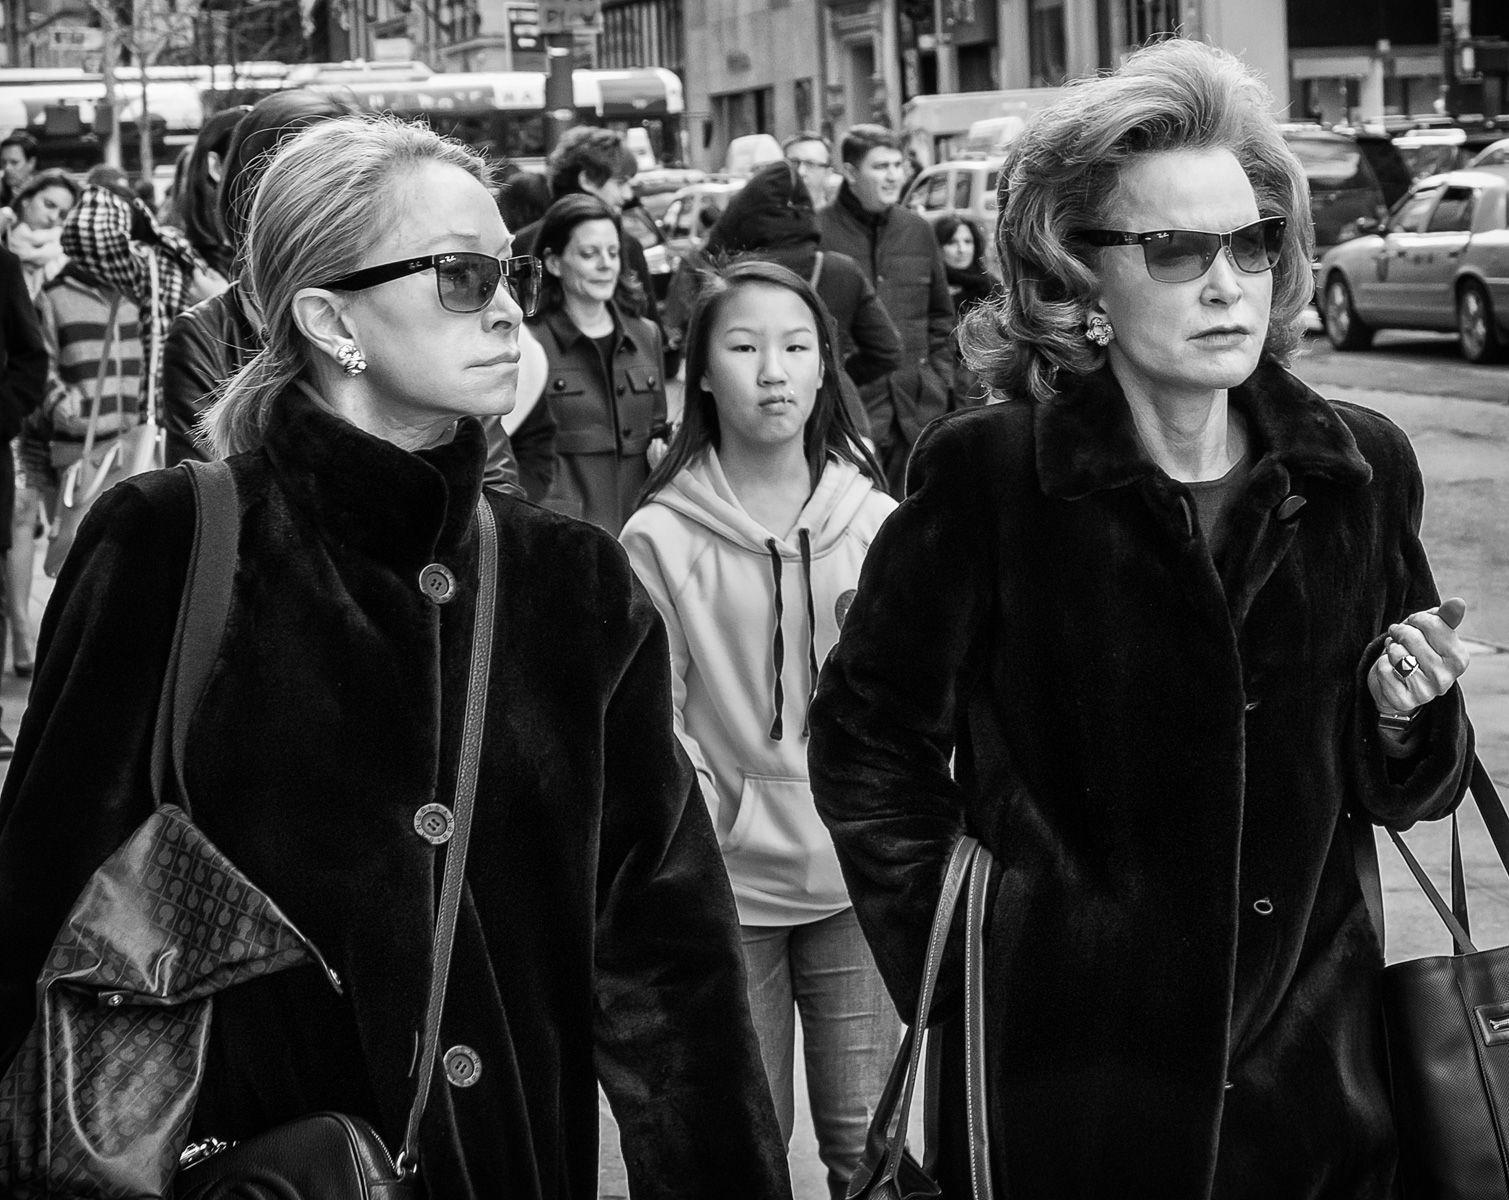 Manhattan, New York  03/13/13